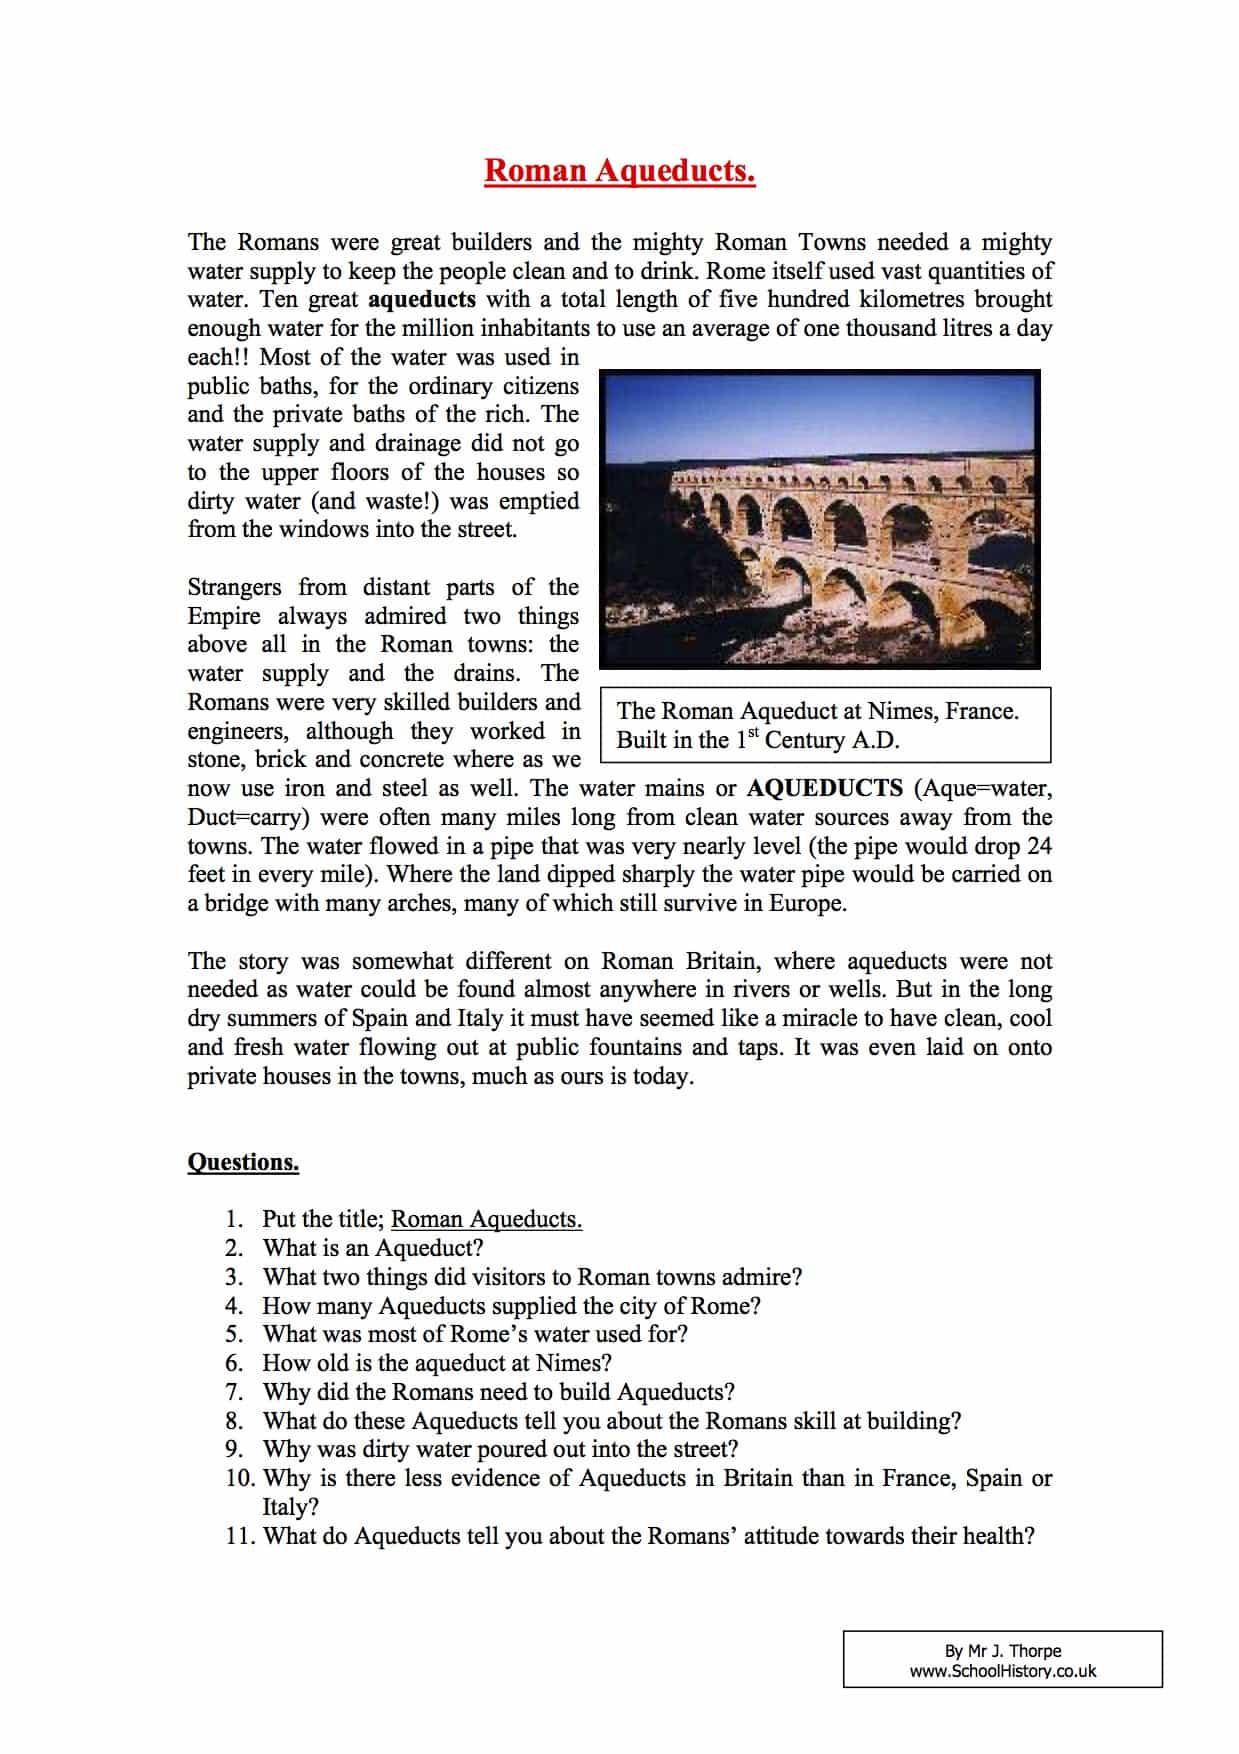 Roman Aqueducts Facts Amp Information